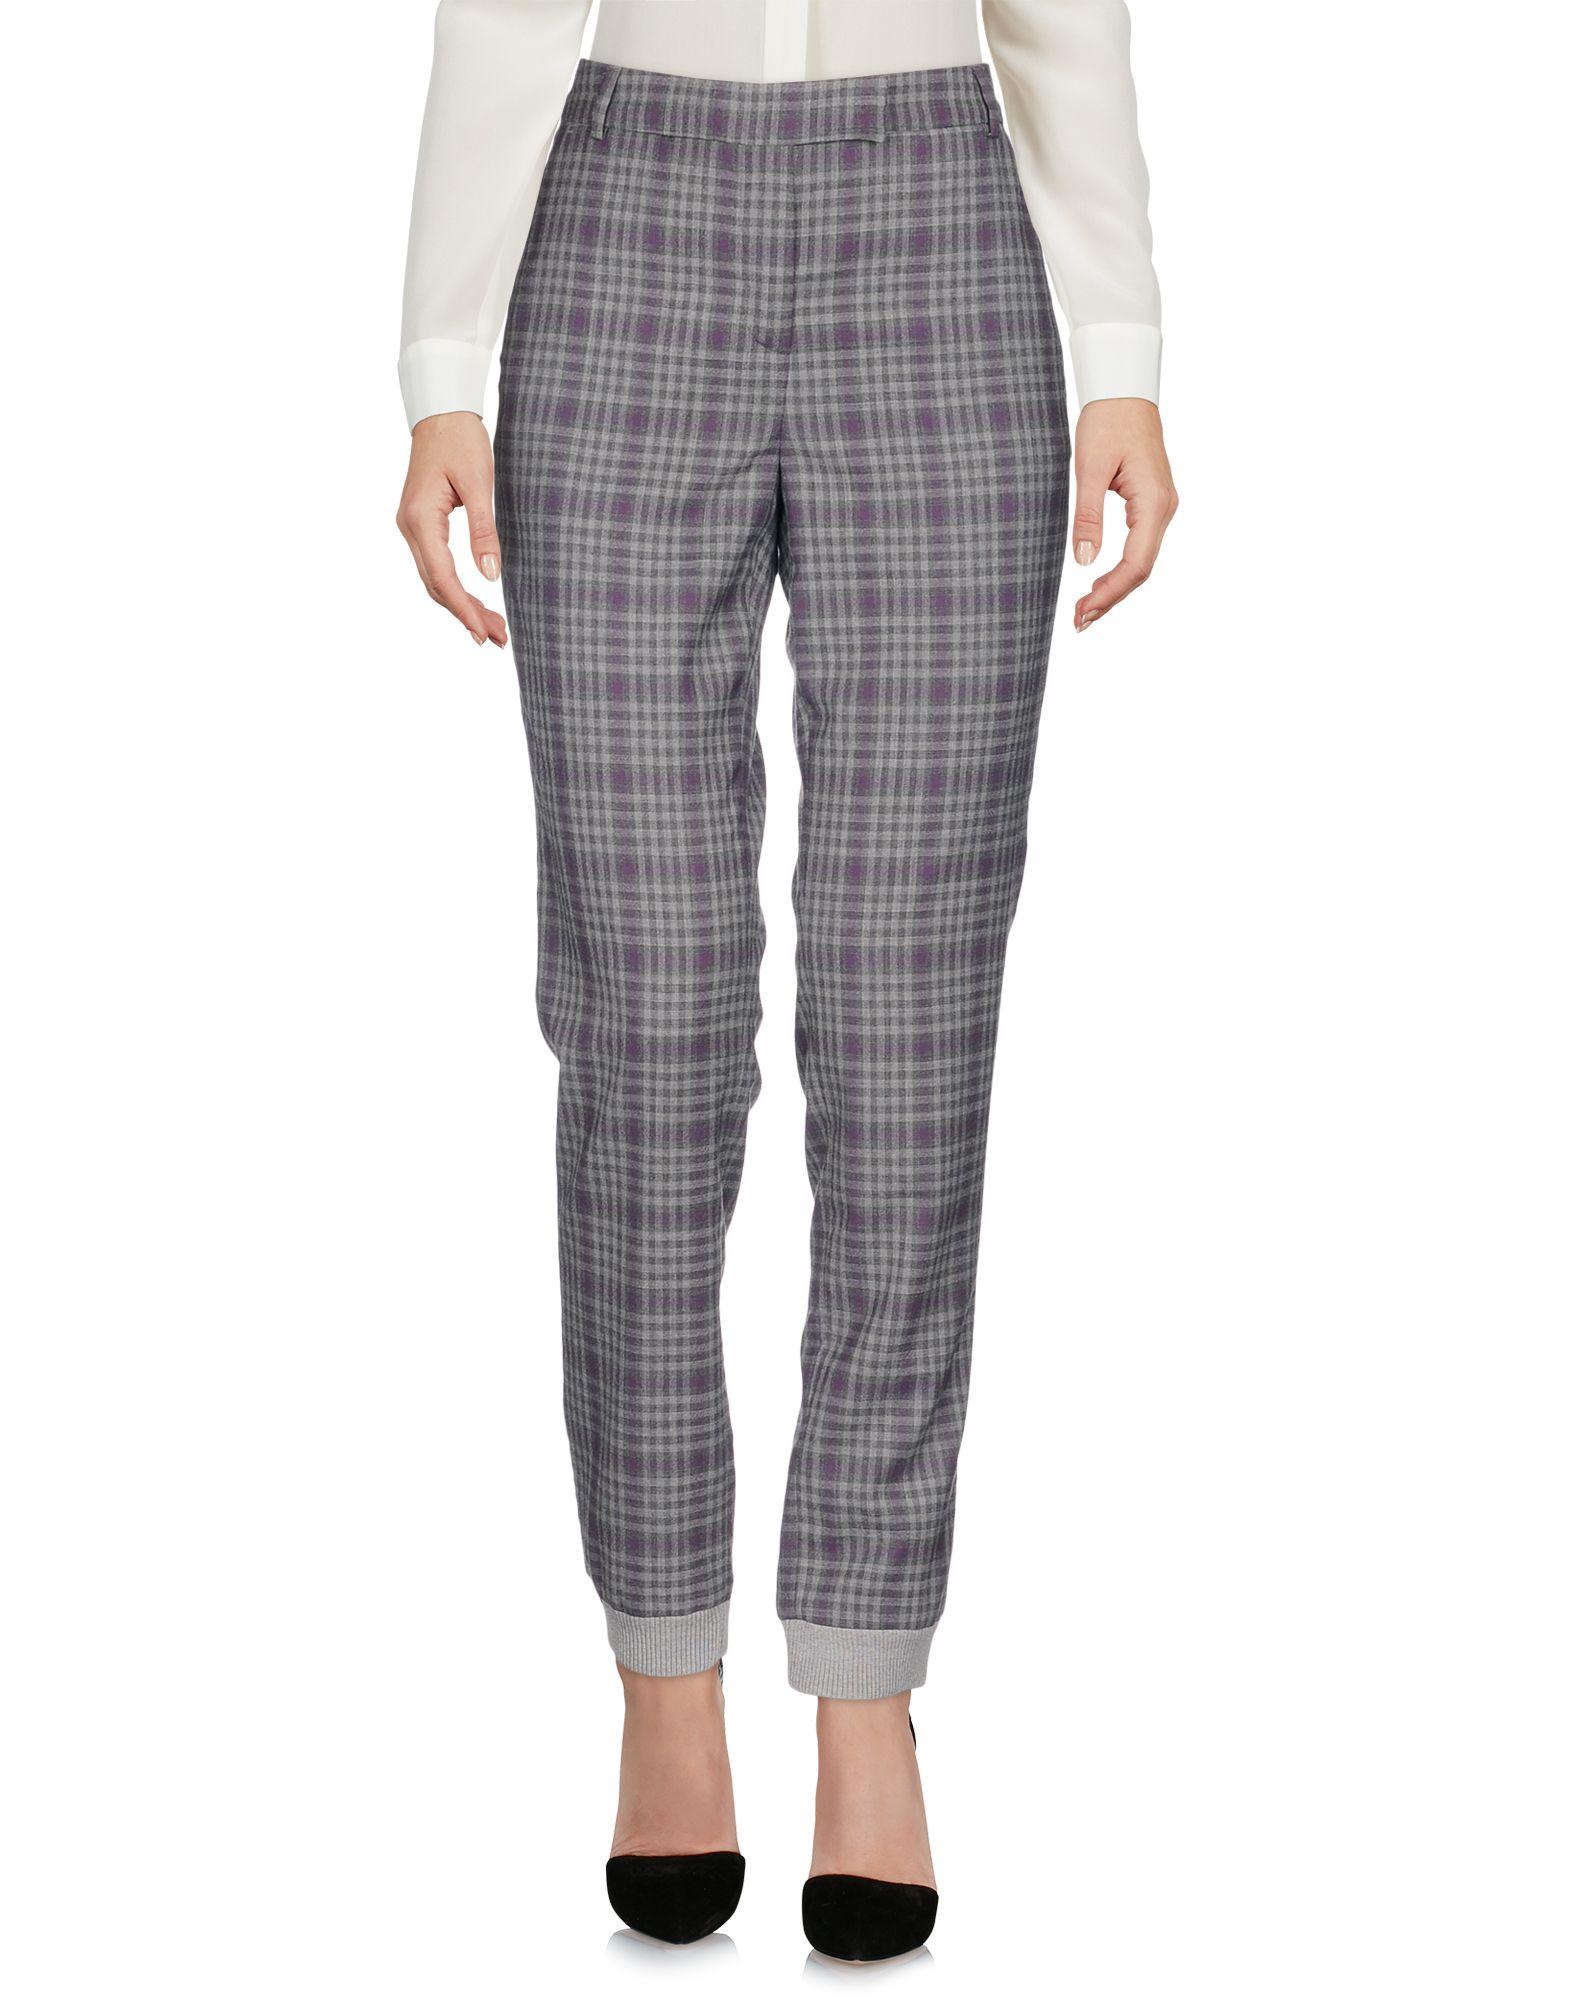 Pantalone Pantalone Pantalone Hilfiger Collection donna - 13206010SV c28